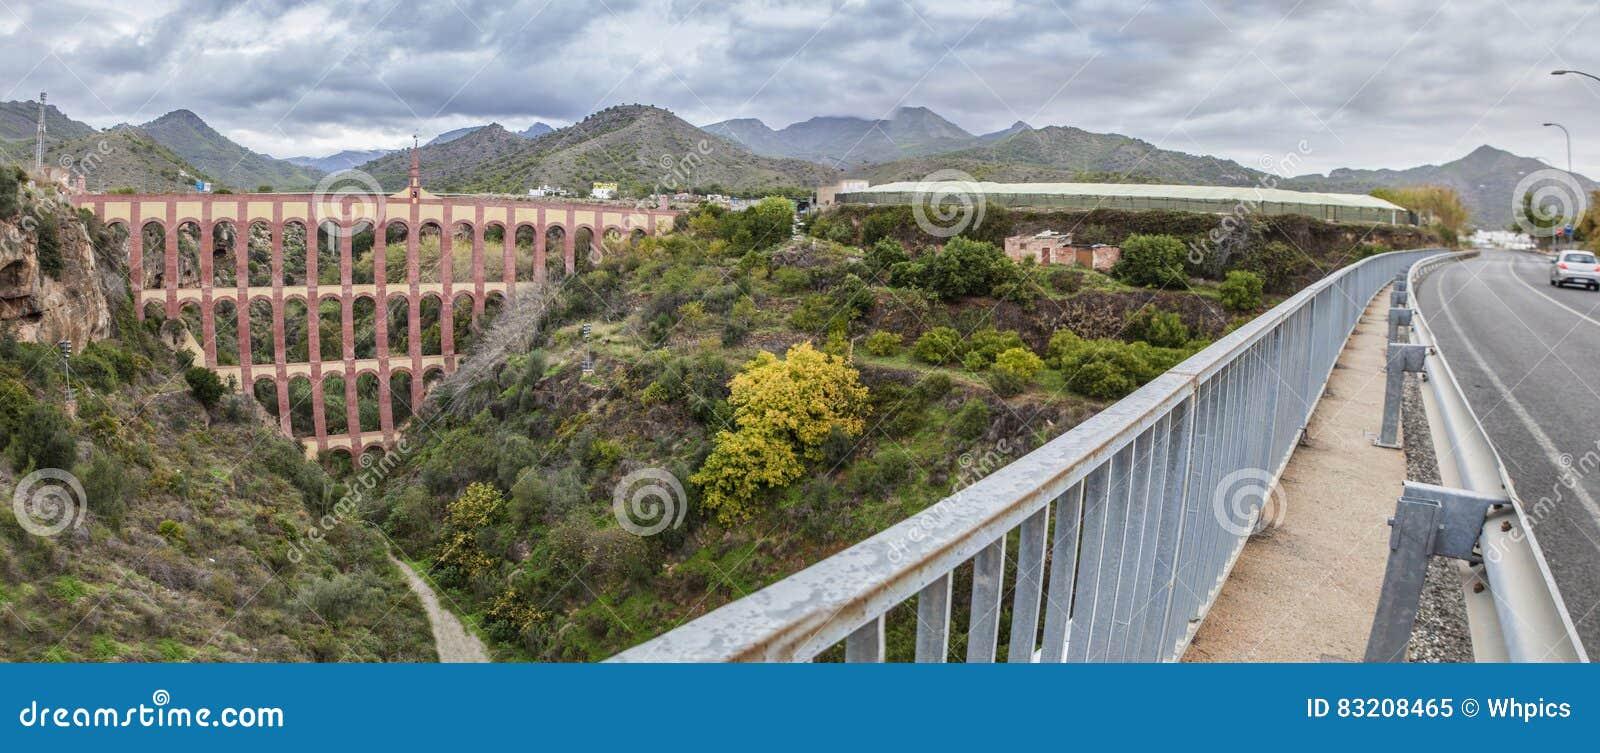 Мост орла в Nerja, Малаге панорамно